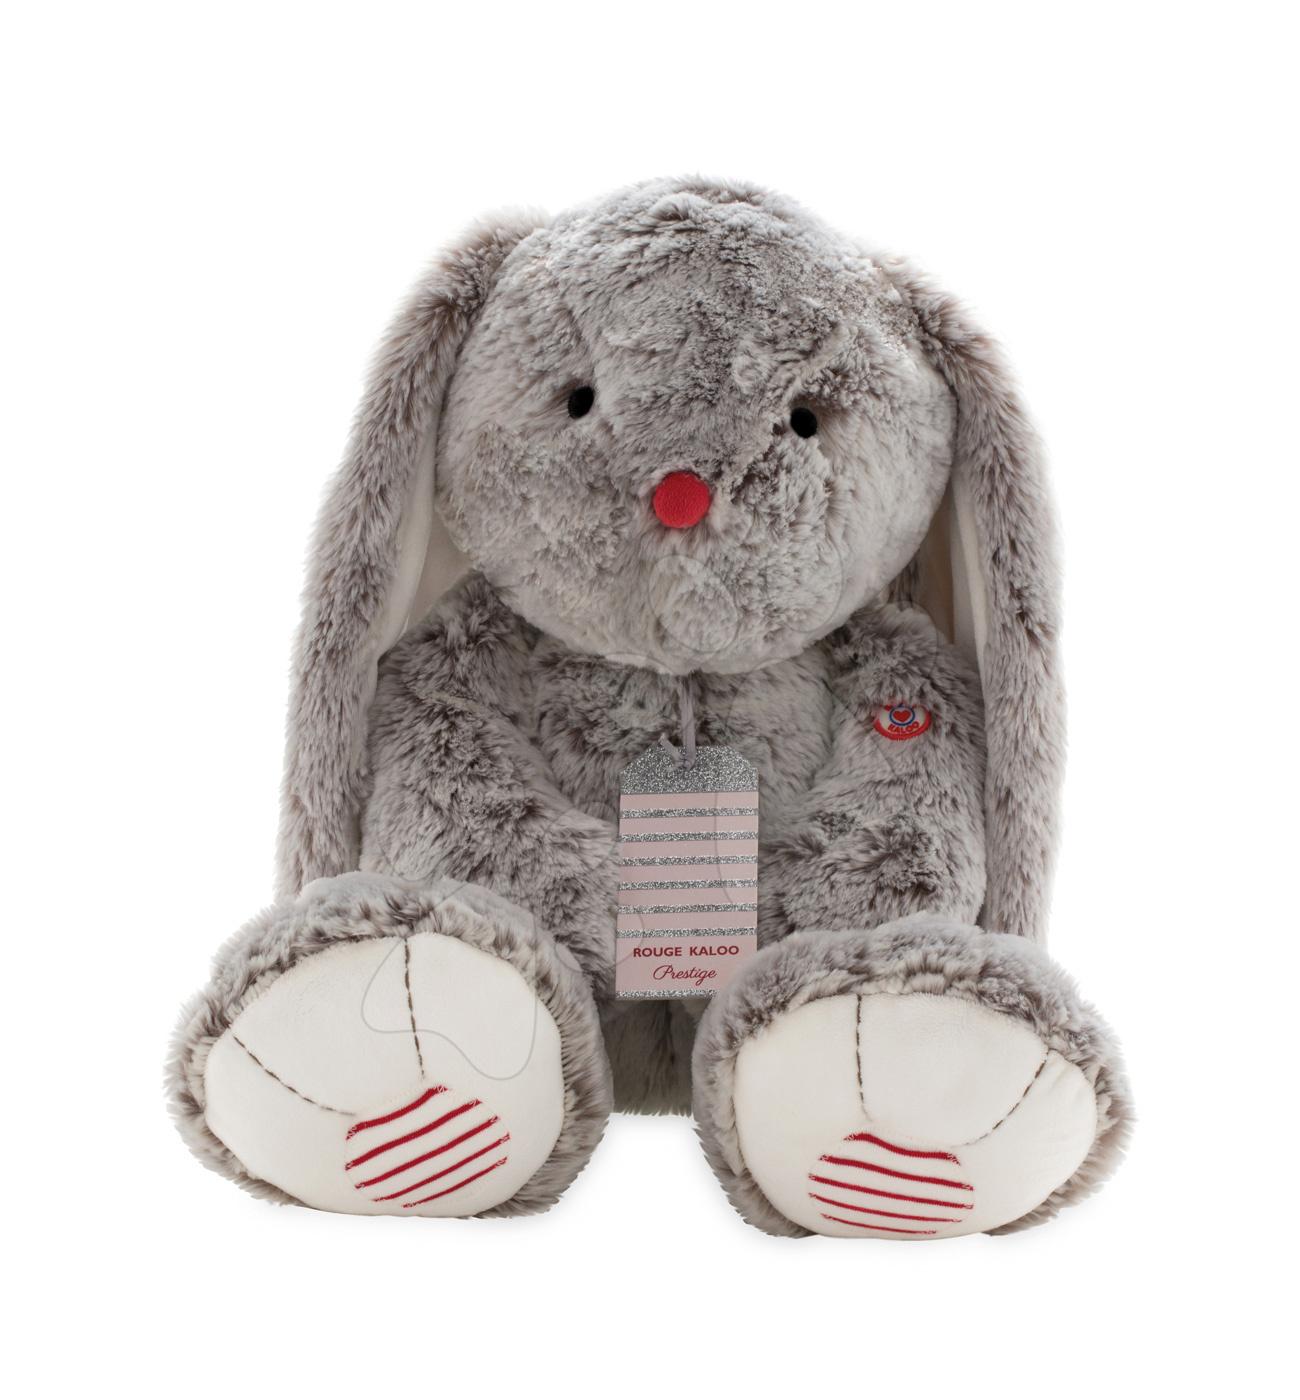 Kaloo plyšový zajko pre deti Rouge Prestige 963539 krémovo-šedý